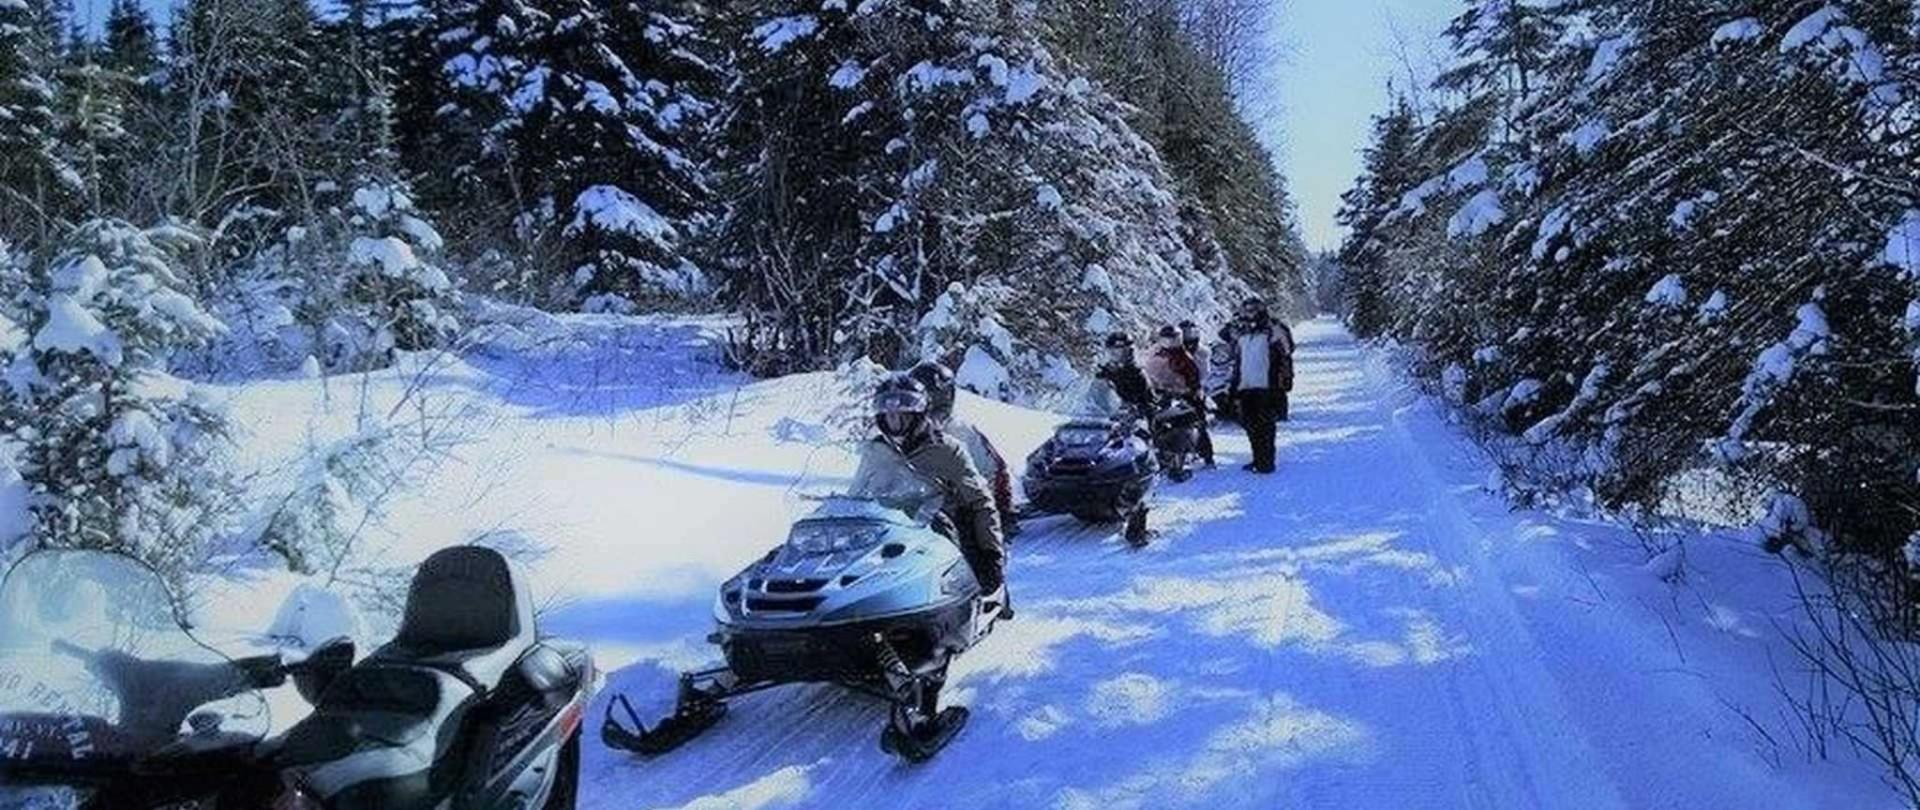 nek-snowmobile-tours.jpg.1920x810_default.jpeg.1920x0.jpeg